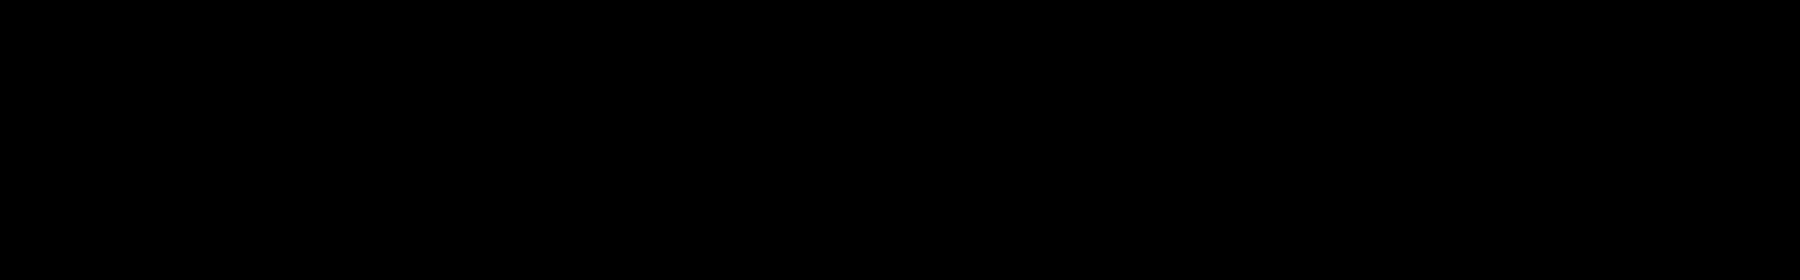 Retro Car Chase audio waveform